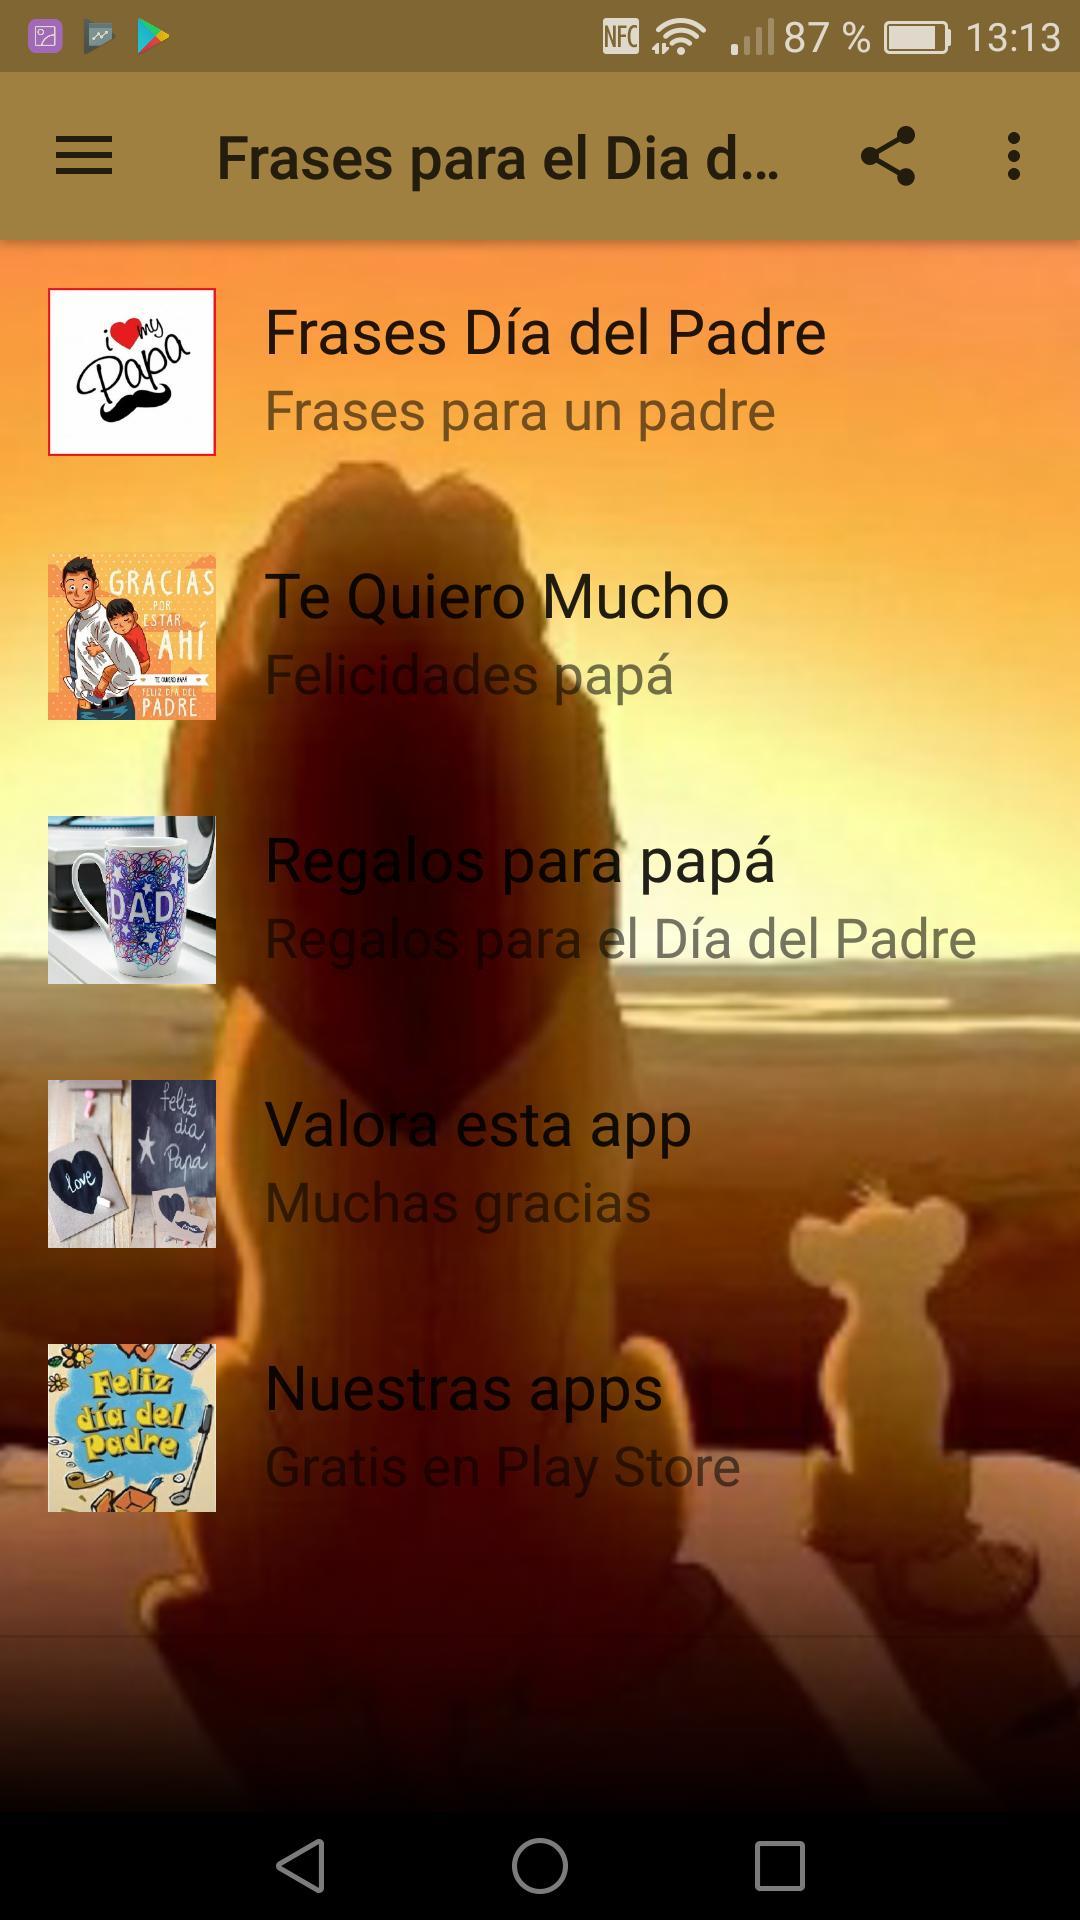 Frases Para El Dia Del Padre для андроид скачать Apk